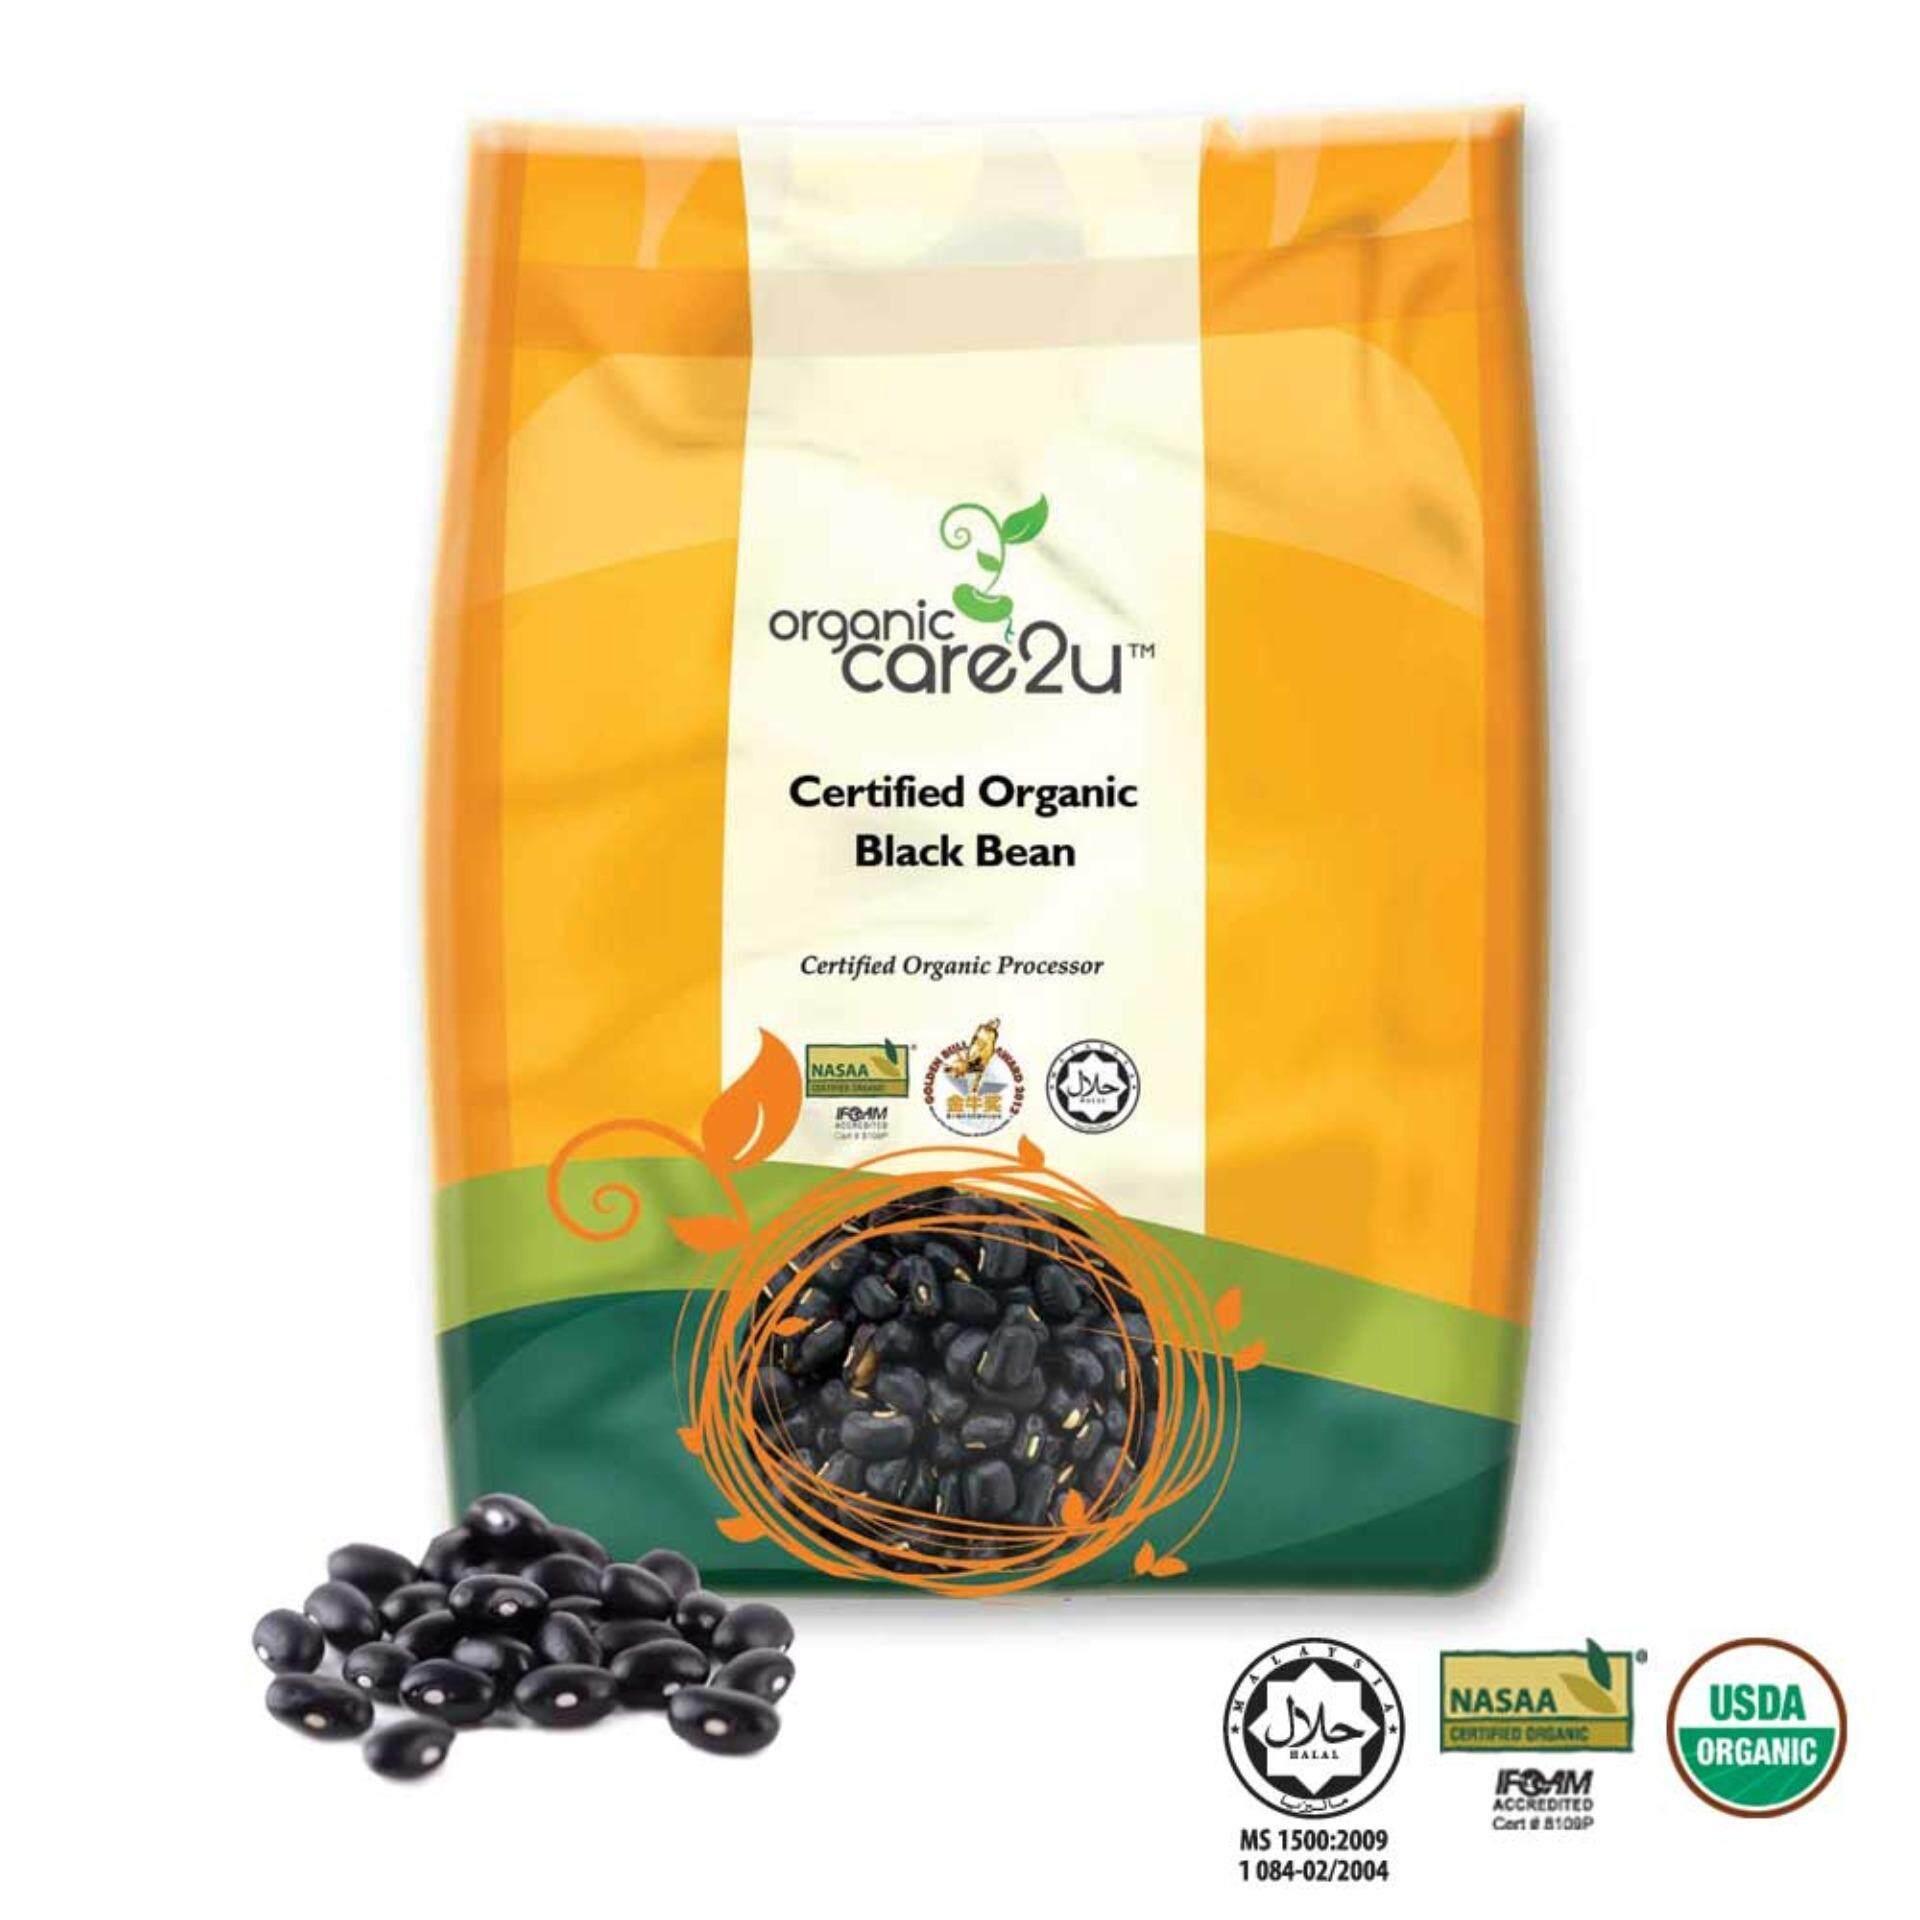 Organic Care2u Organic Black Bean with Green Kernel (400g)